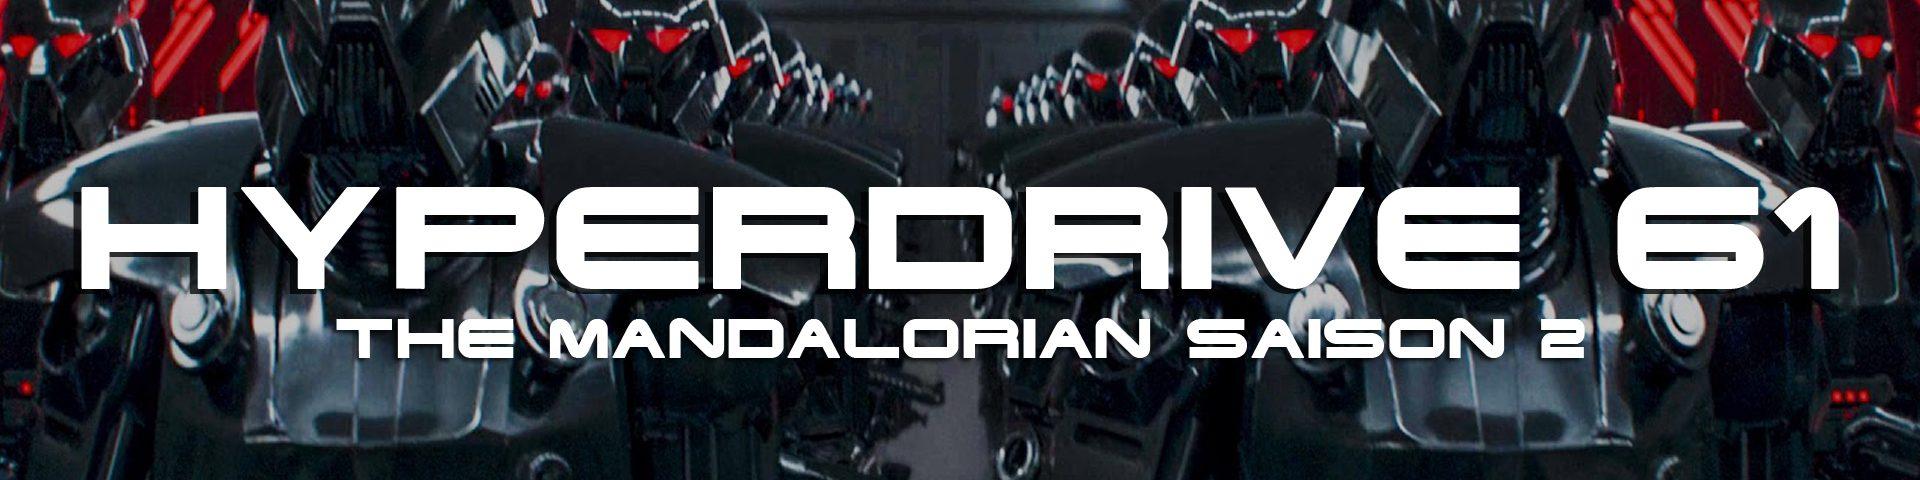 The Mandalorian saison 2 - Hyperdrive